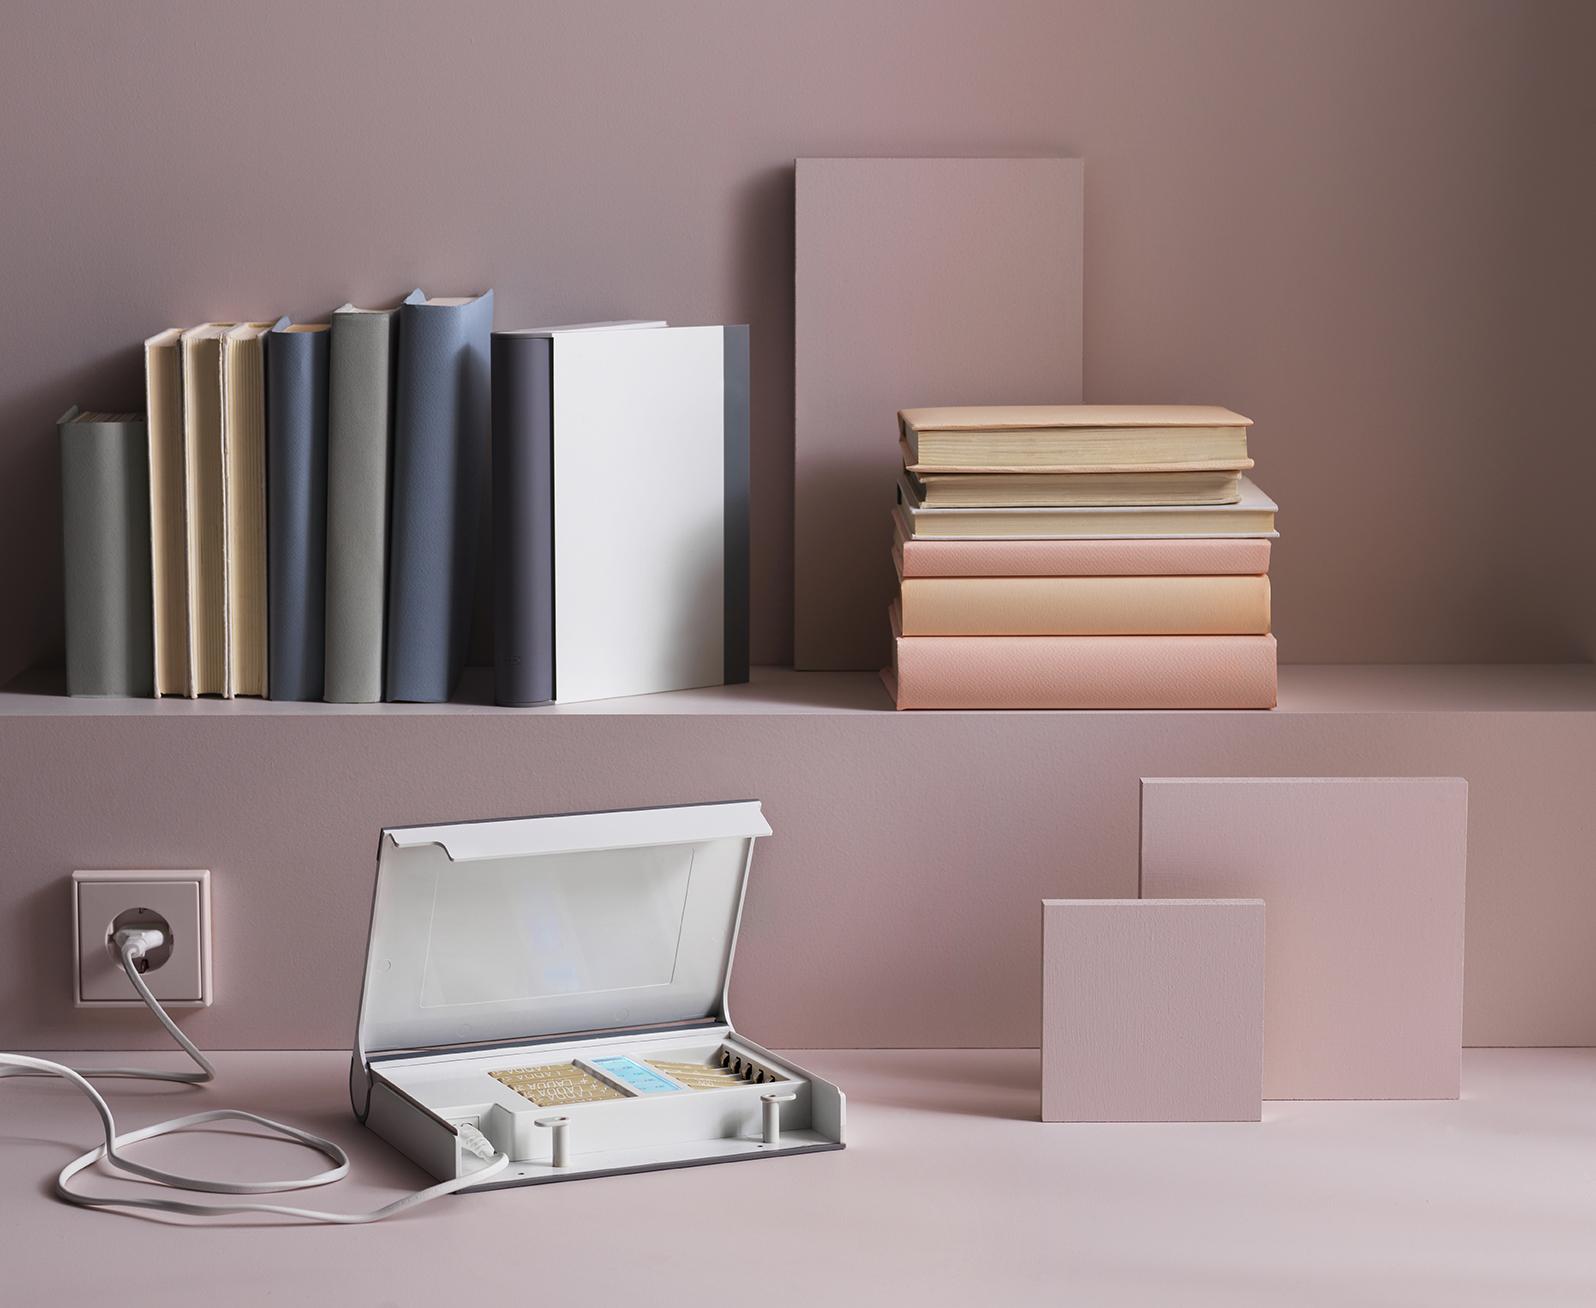 ikea 3 collections d di es au d veloppement durable untitled magazine. Black Bedroom Furniture Sets. Home Design Ideas